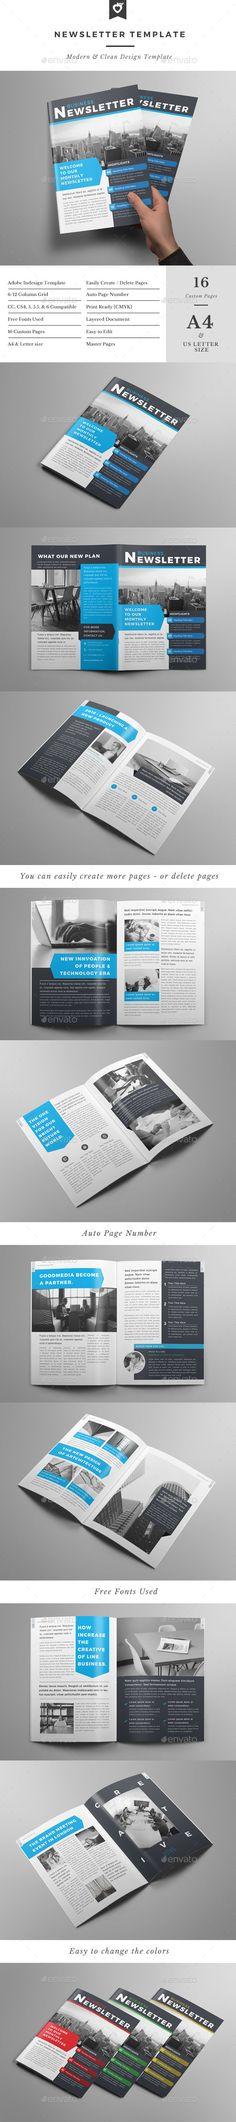 Newsletter - #Newsletters #Print #Templates Download here: https://graphicriver.net/item/newsletter/12940993?ref=alena994